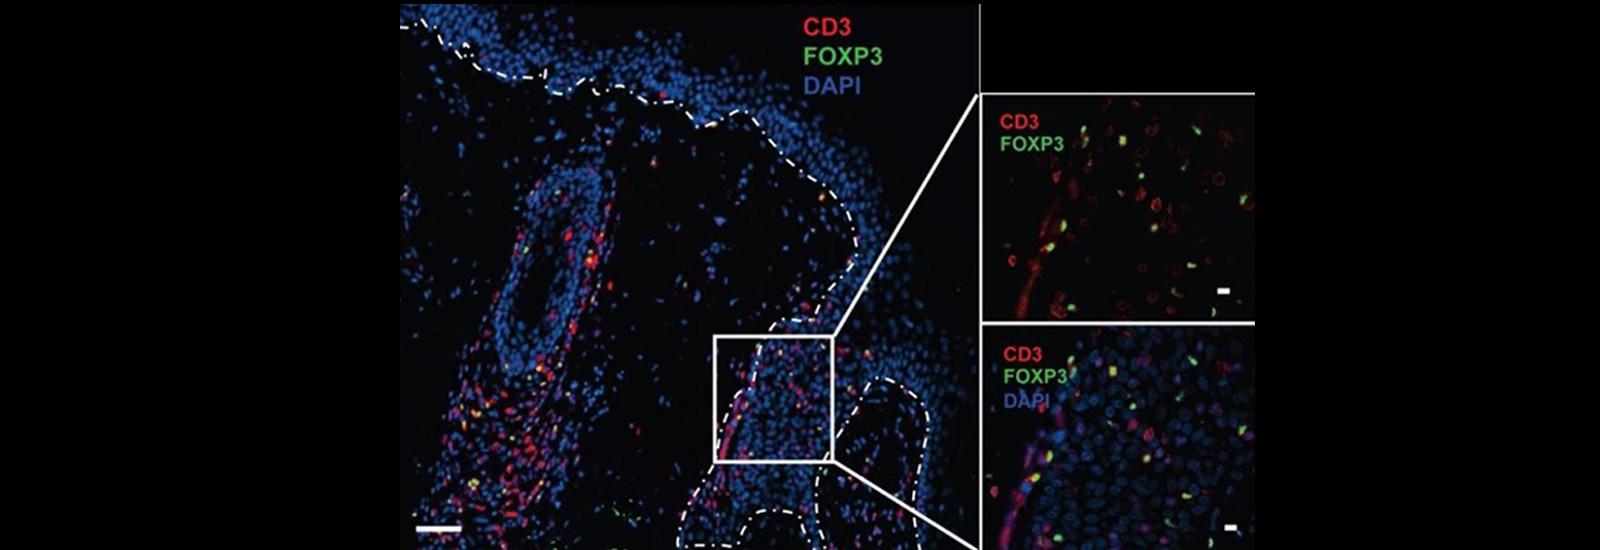 Aquiderm cellule de transfert ADERA CRO infllammation dermatologie cancer